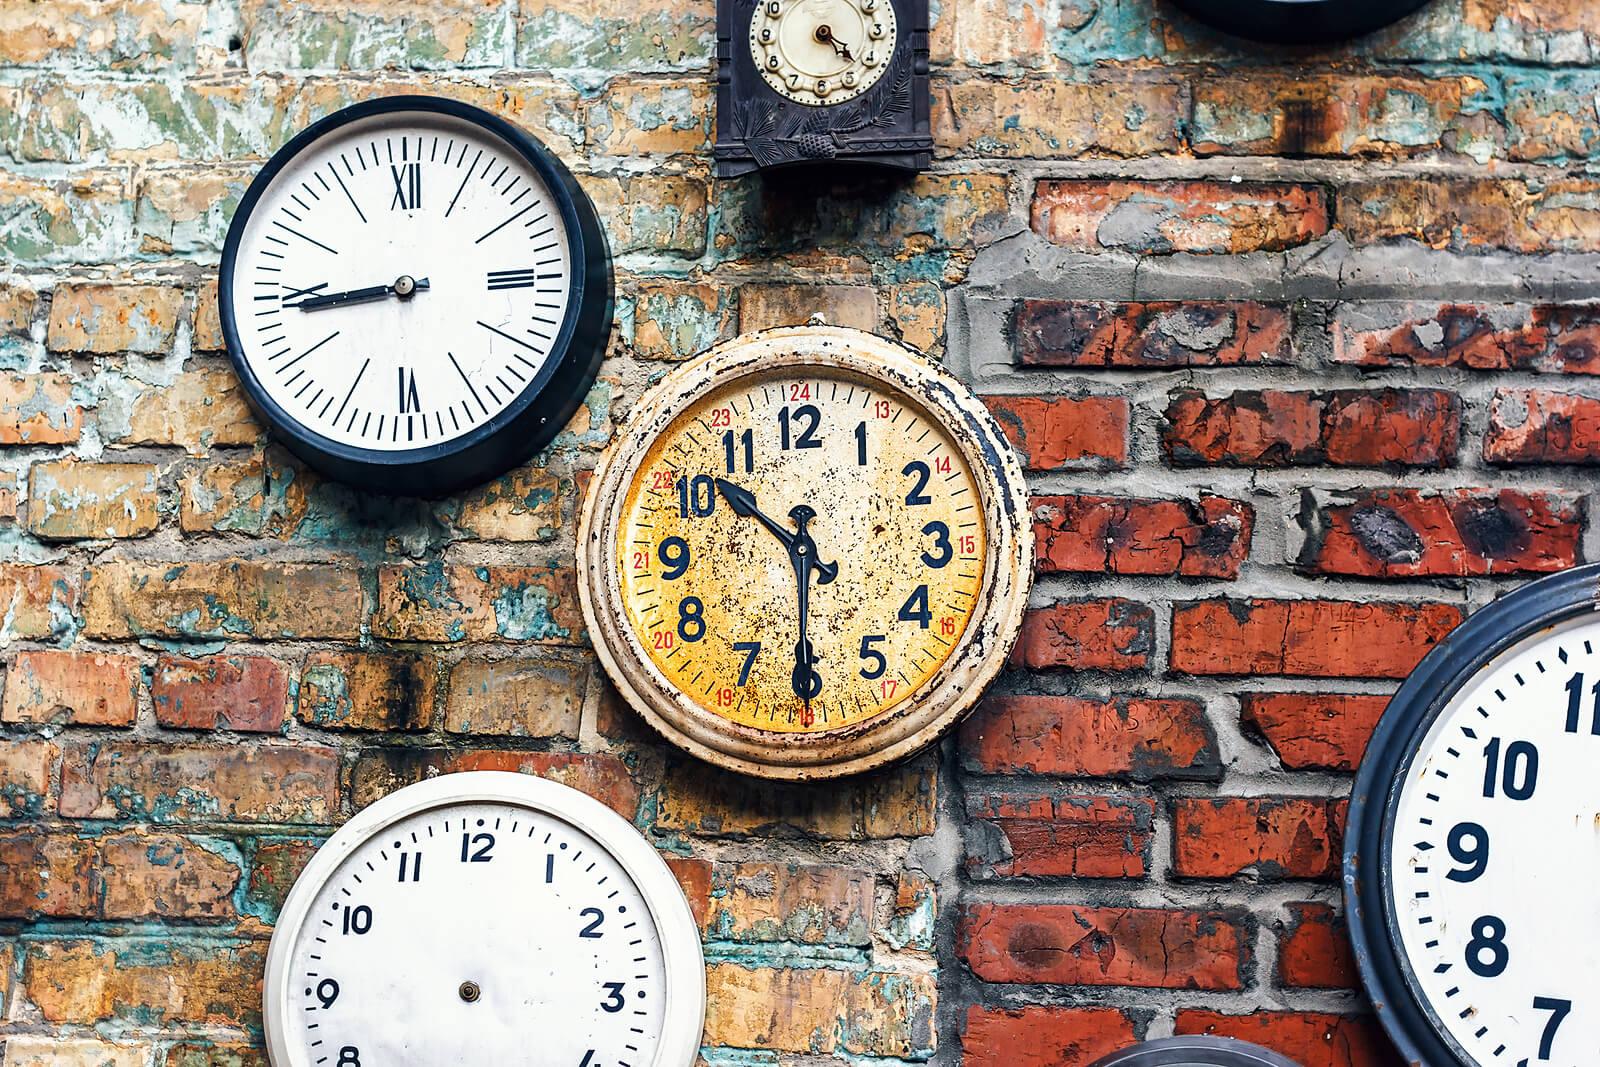 Slow Web - Wall full of clocks